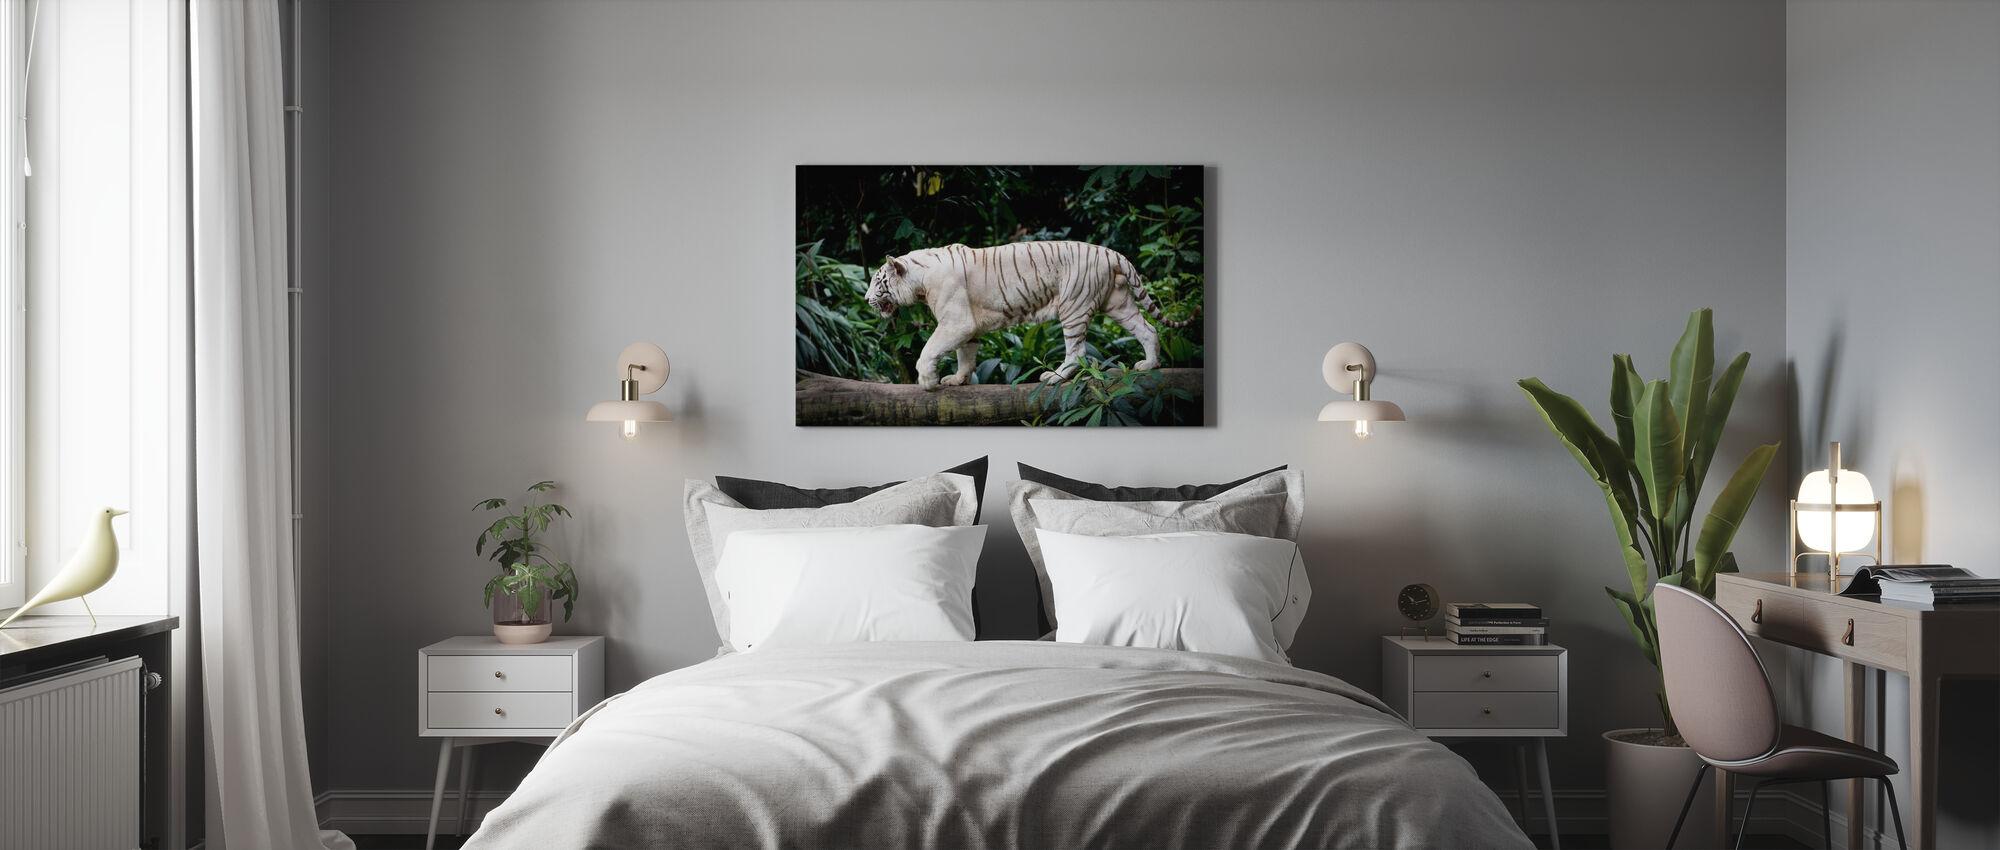 Man Witte Tijger - Canvas print - Slaapkamer